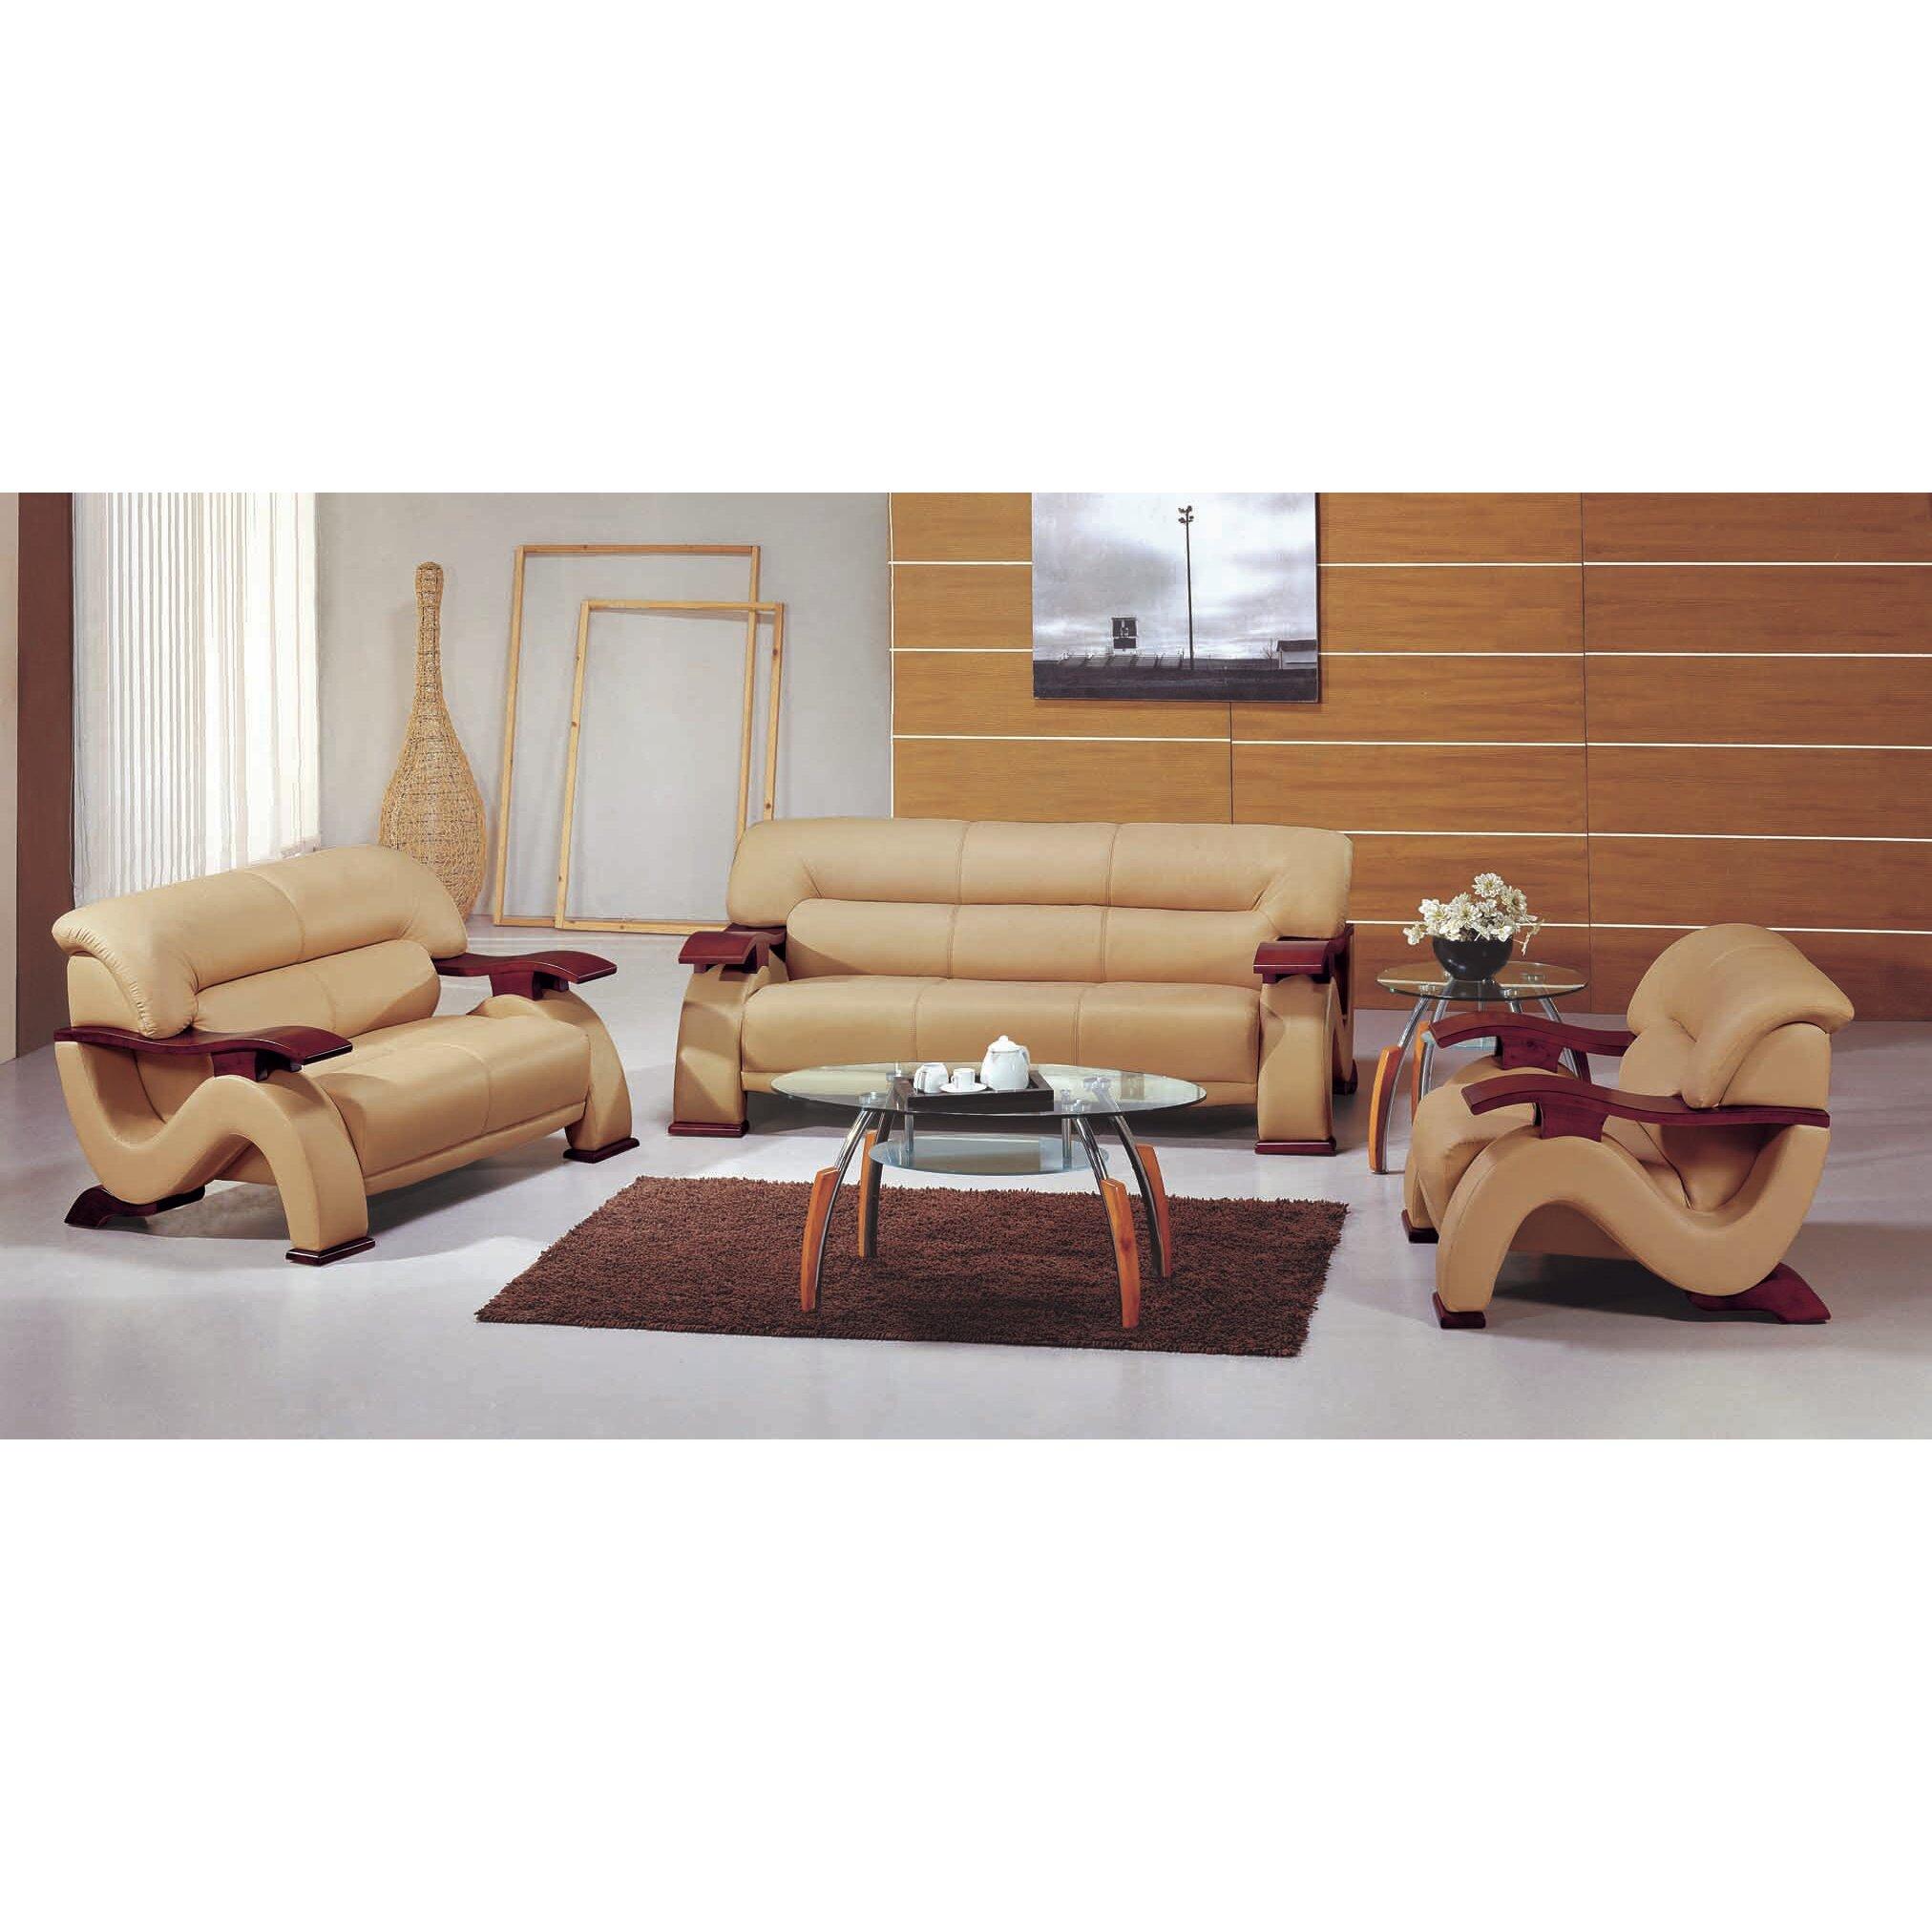 hokku designs chrysocolla 3 piece leather sofa set reviews w